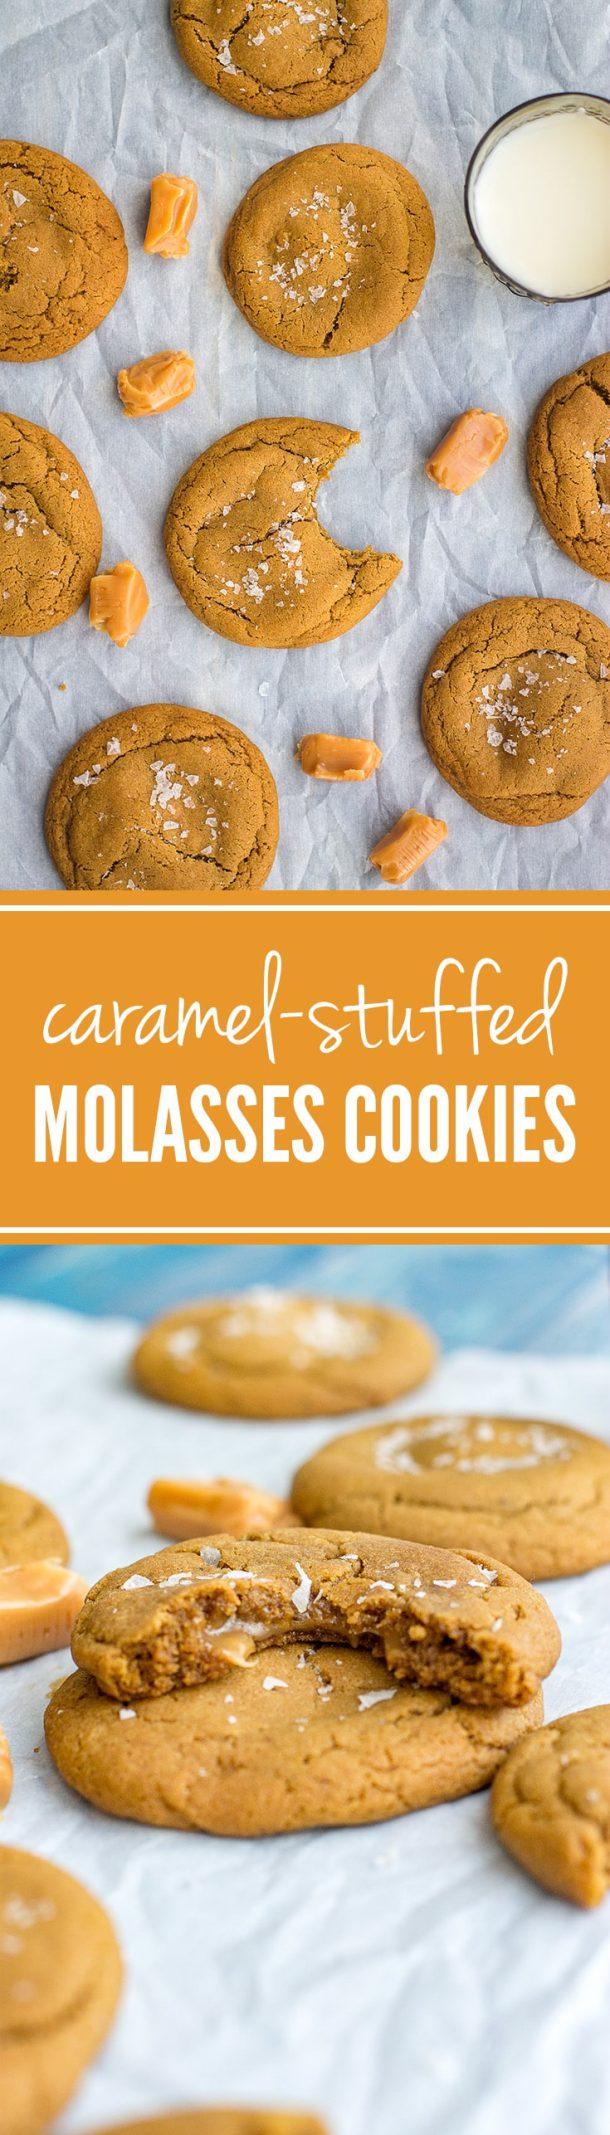 Caramel-stuffed molasses cookies | Soft brown sugar molasses cookies loaded with chewy caramel. Irresistible! #fallbaking #molassescookies